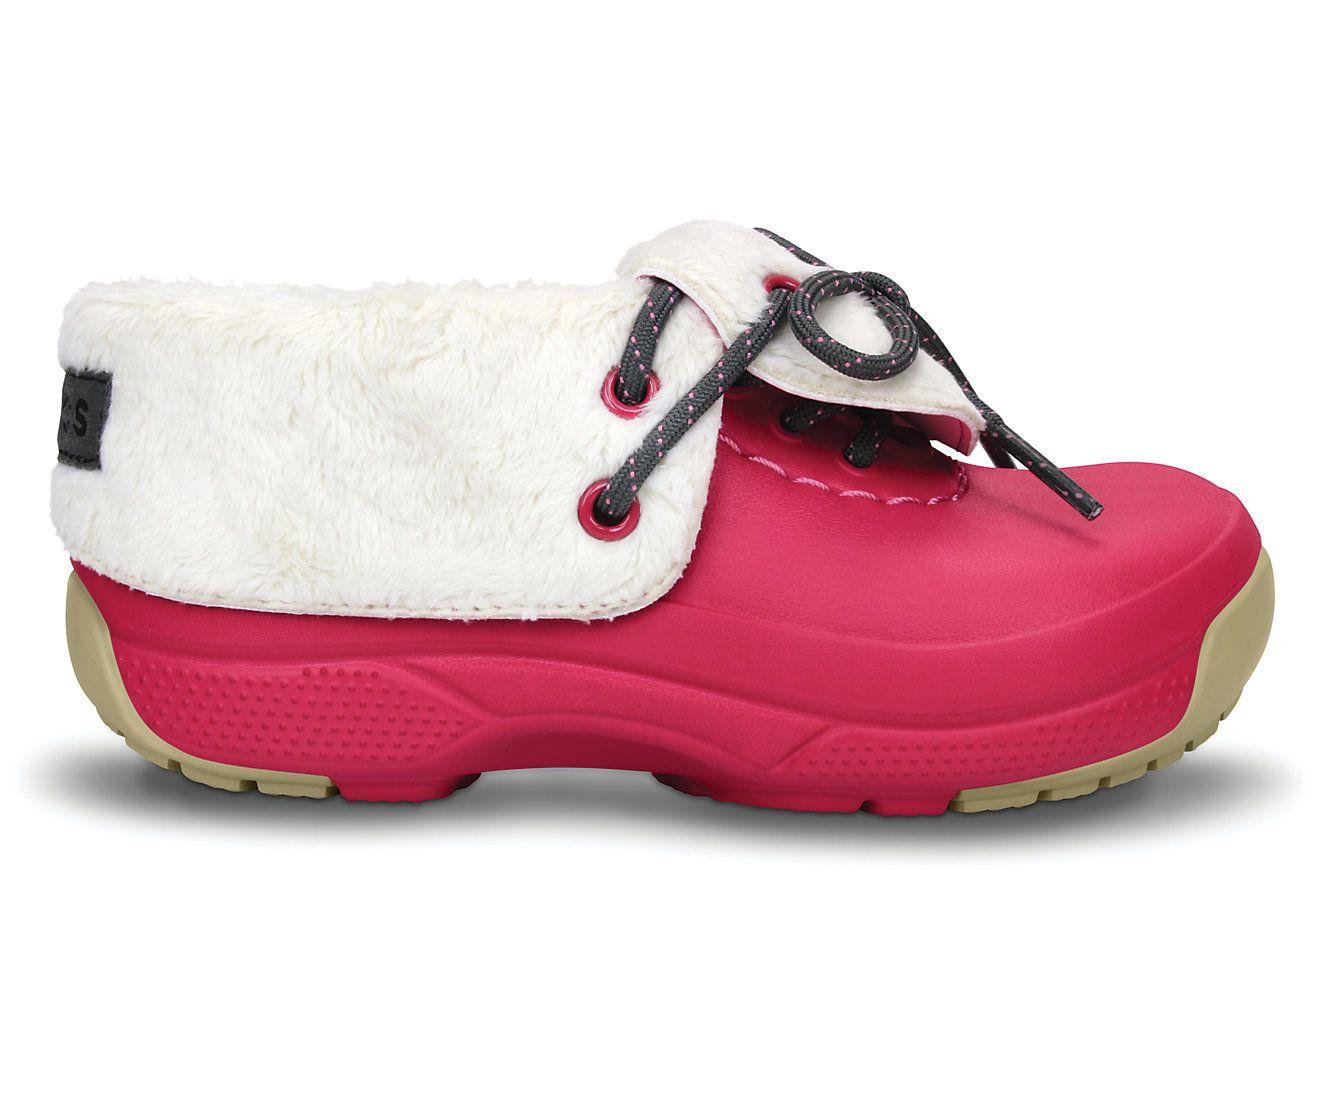 Girls' Boots | Crocs™ Comfortable Rain